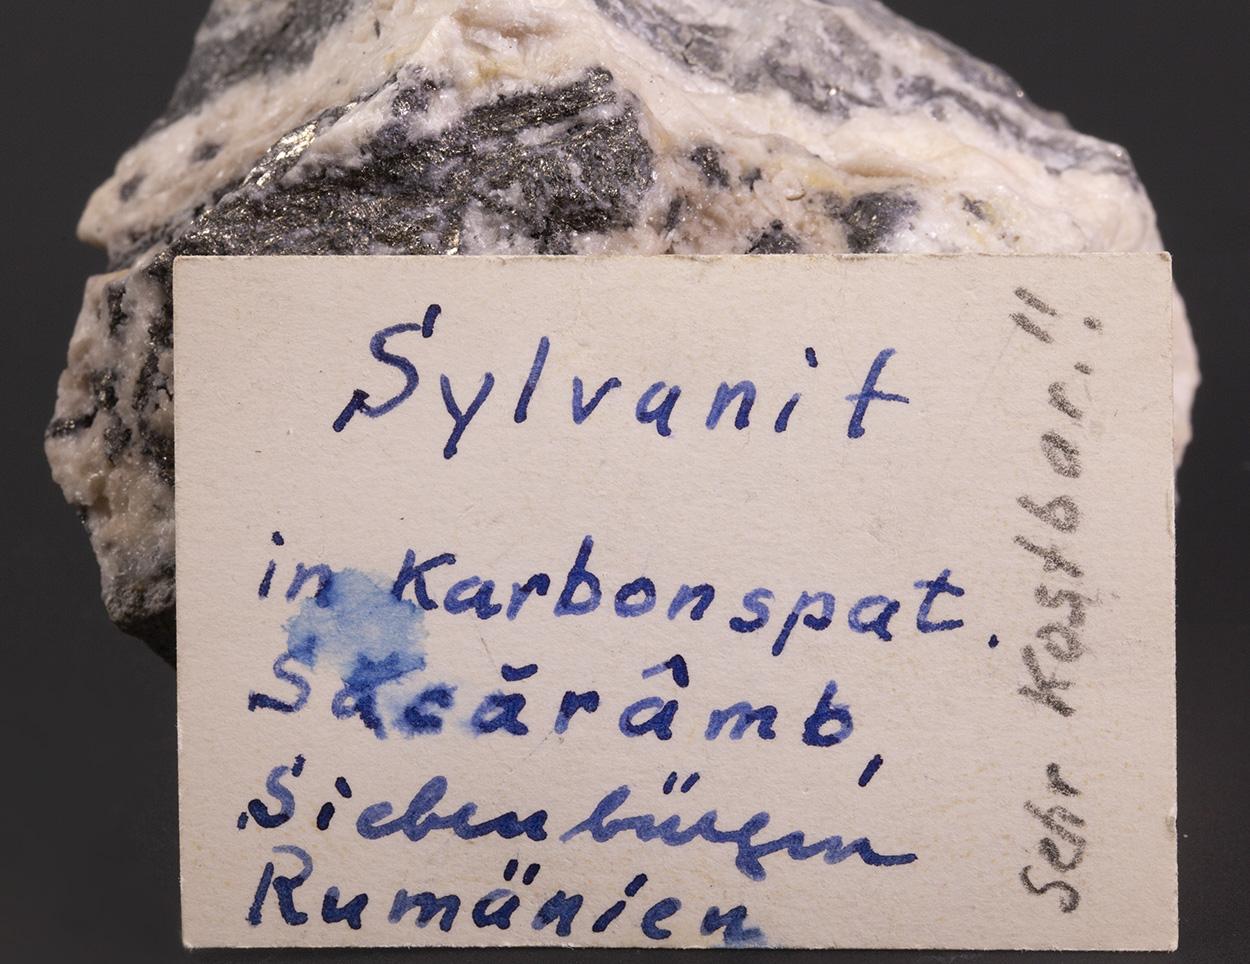 Sylvanite